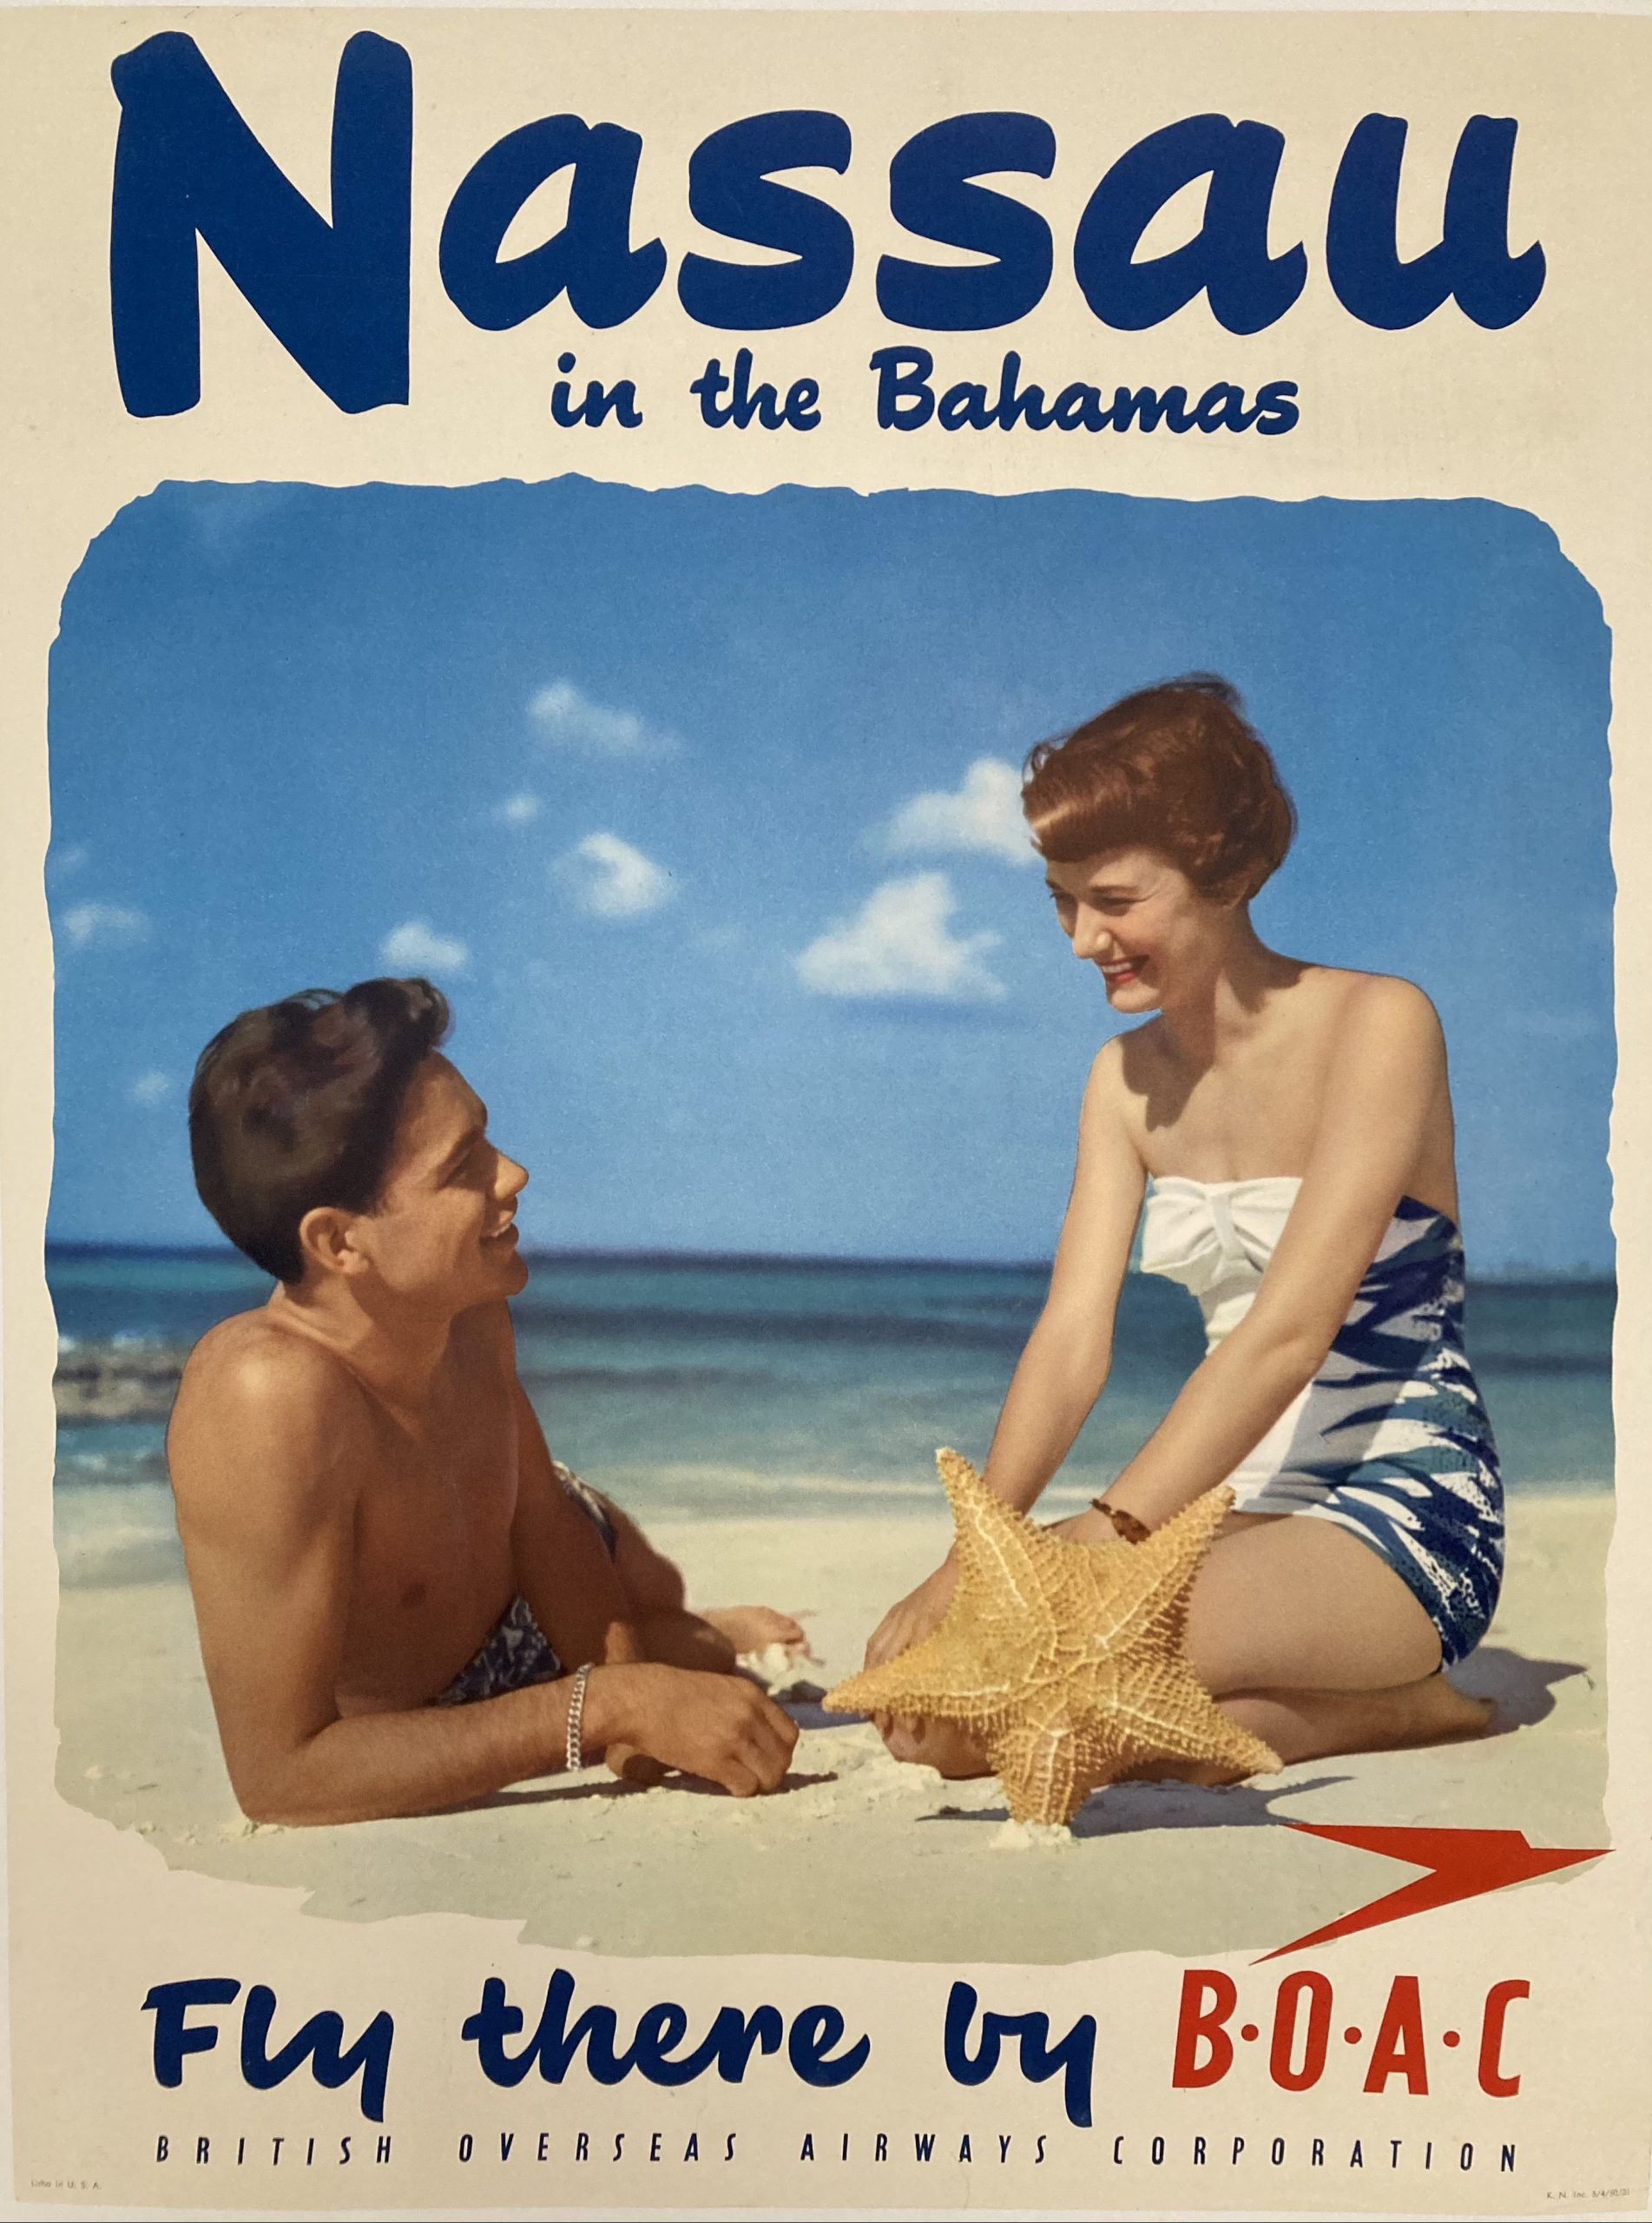 Fly to Nassau by BOAC